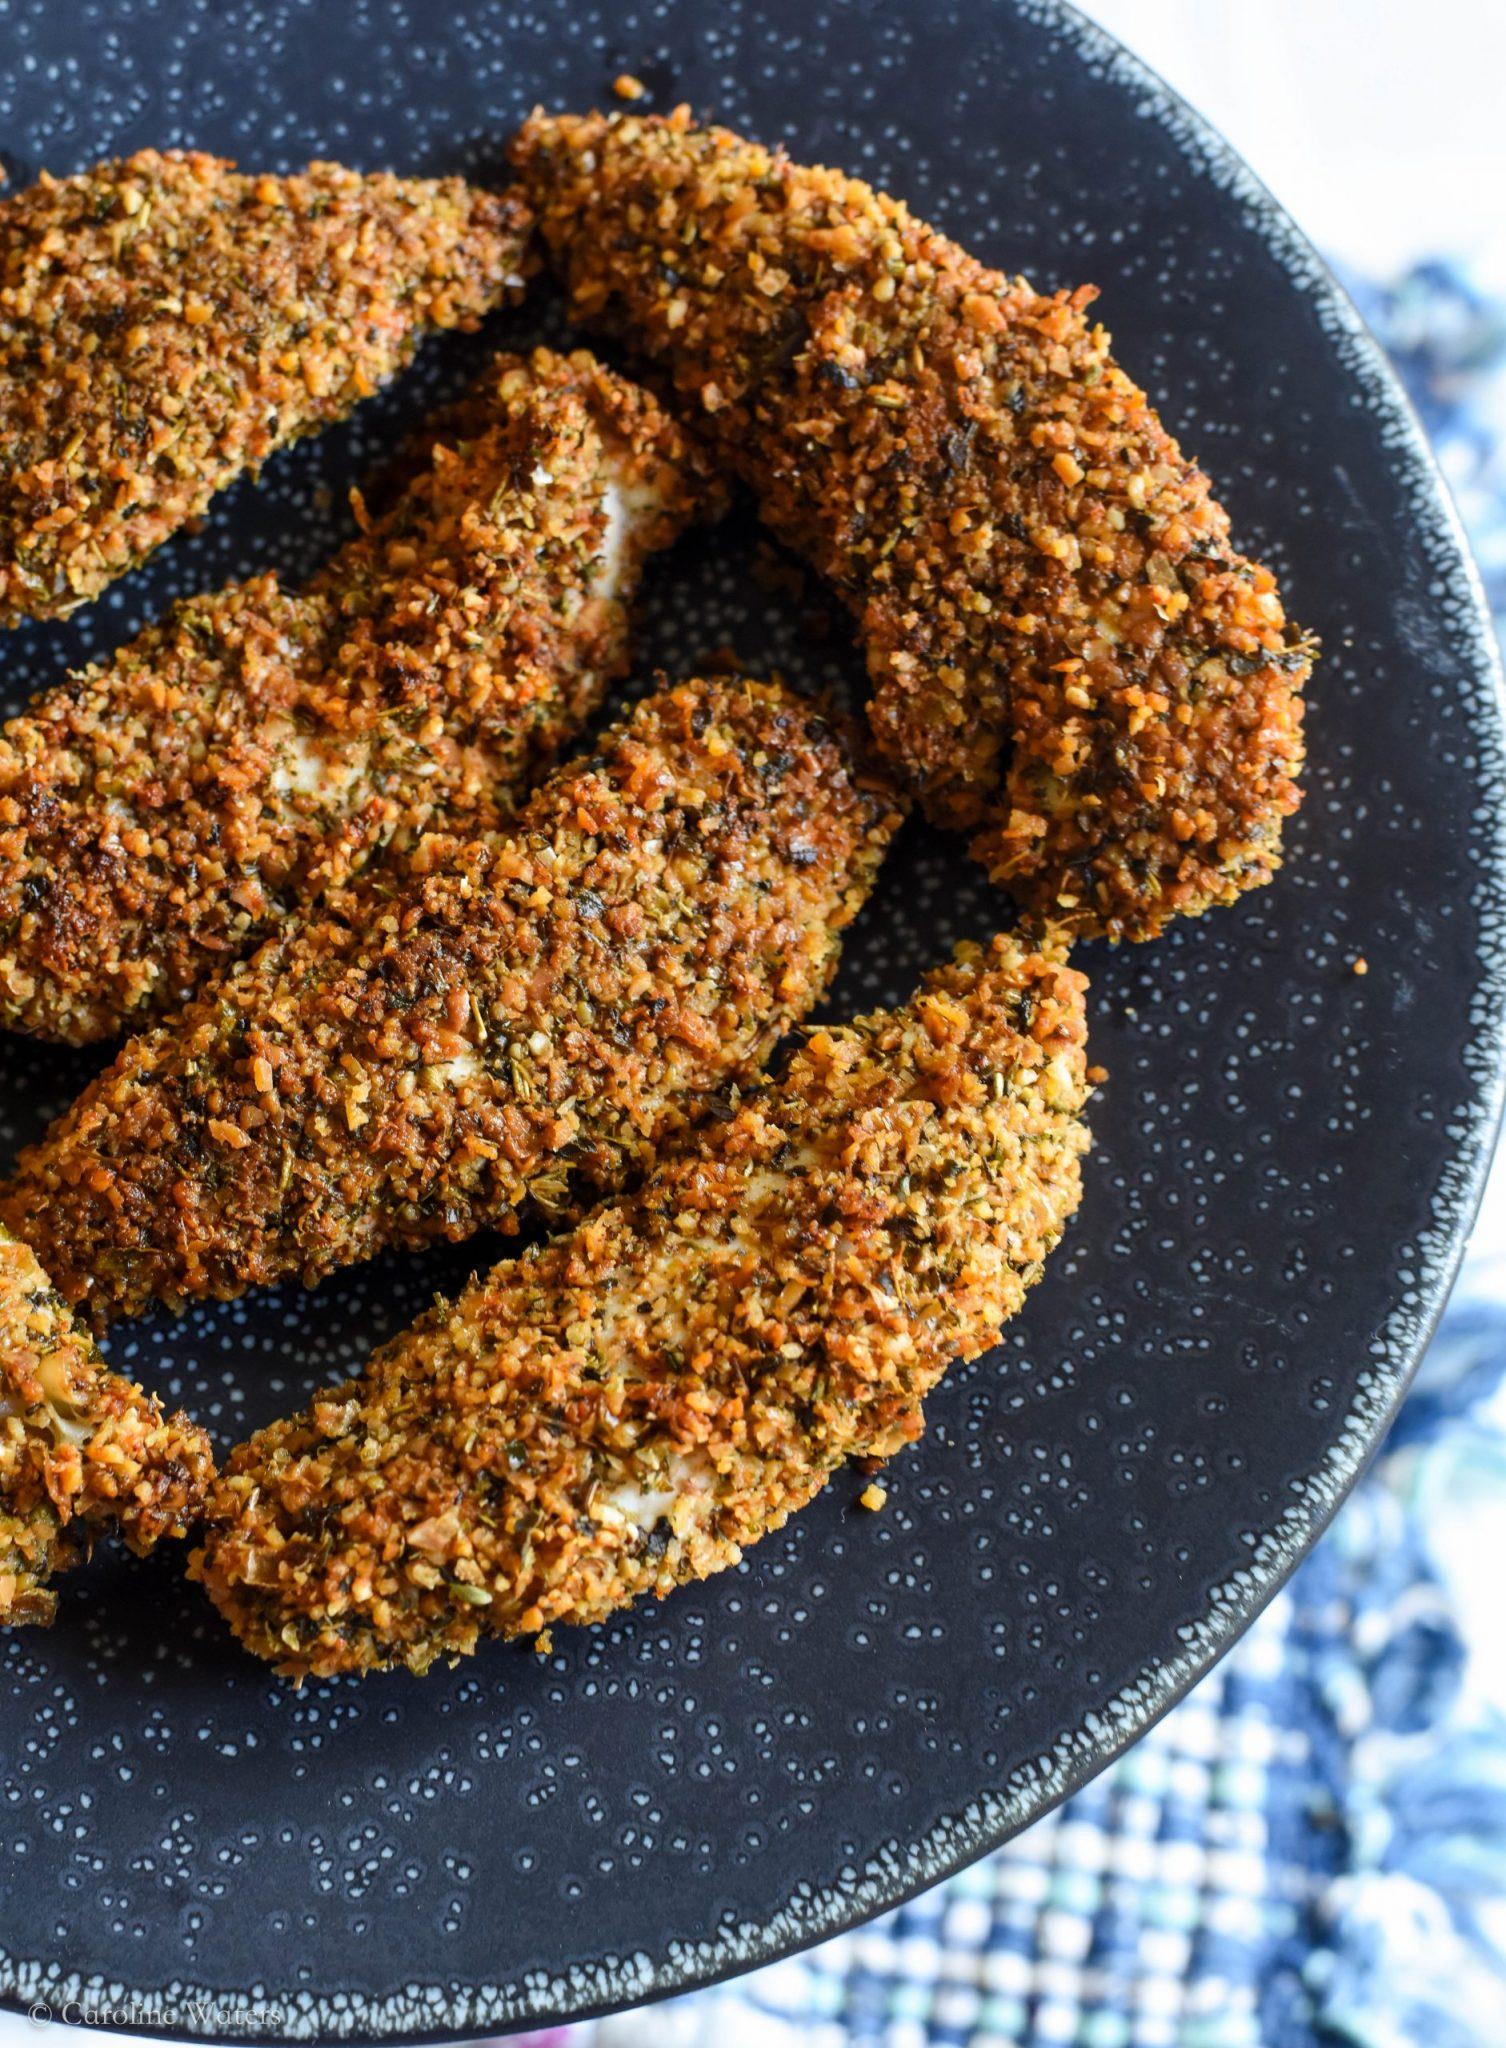 chickpea-coated-chicken-tenders